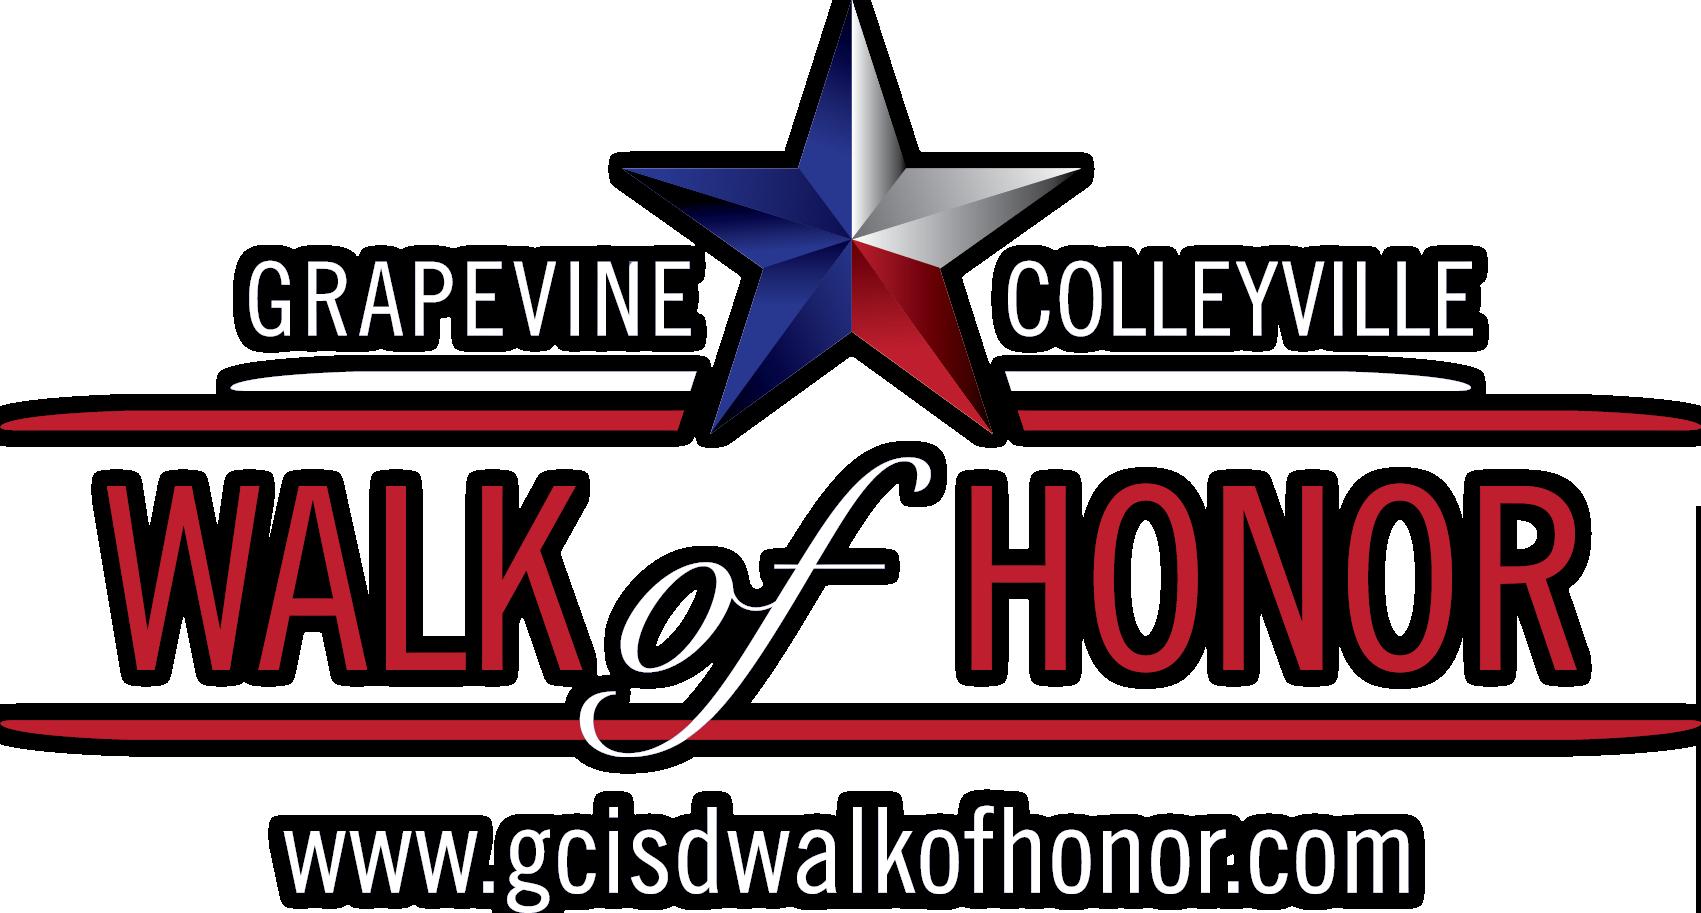 GCISD Walk of Honor